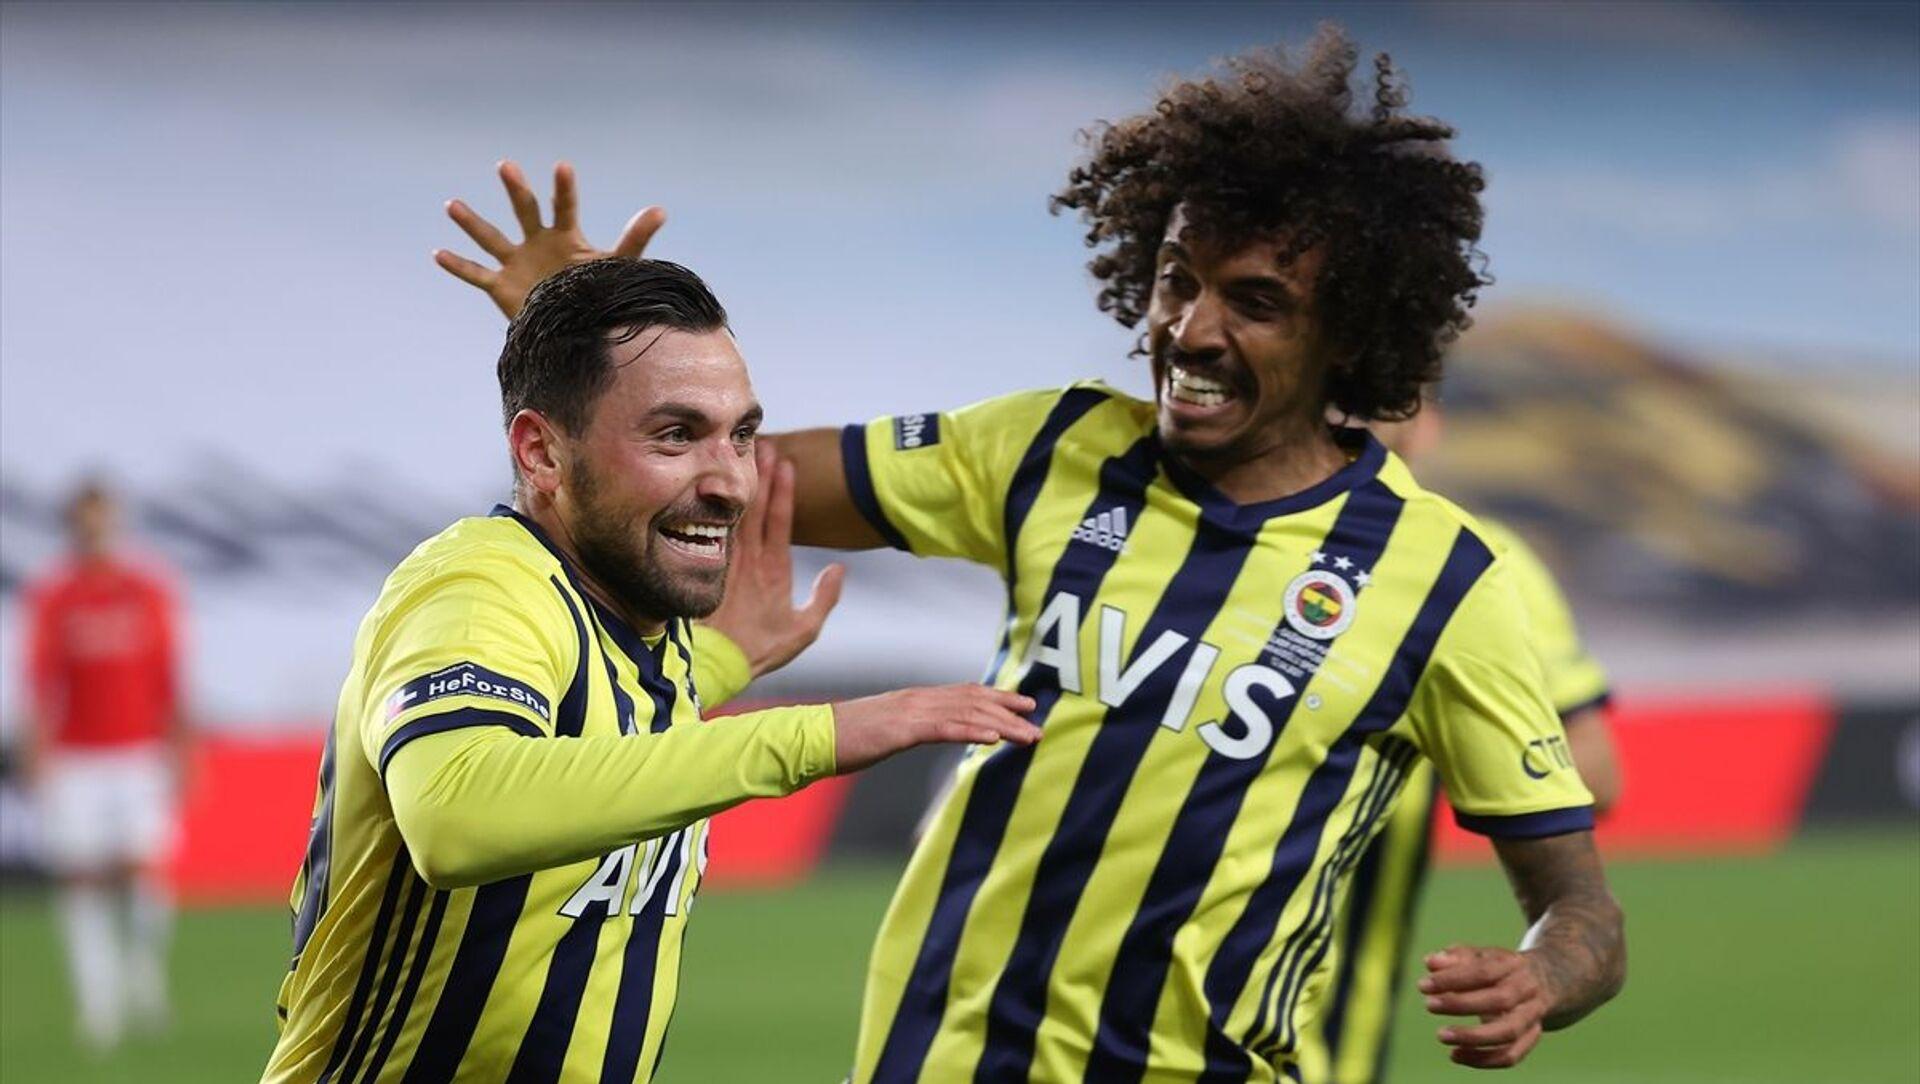 Fenerbahçe - Gaziantep - Sputnik Türkiye, 1920, 13.04.2021